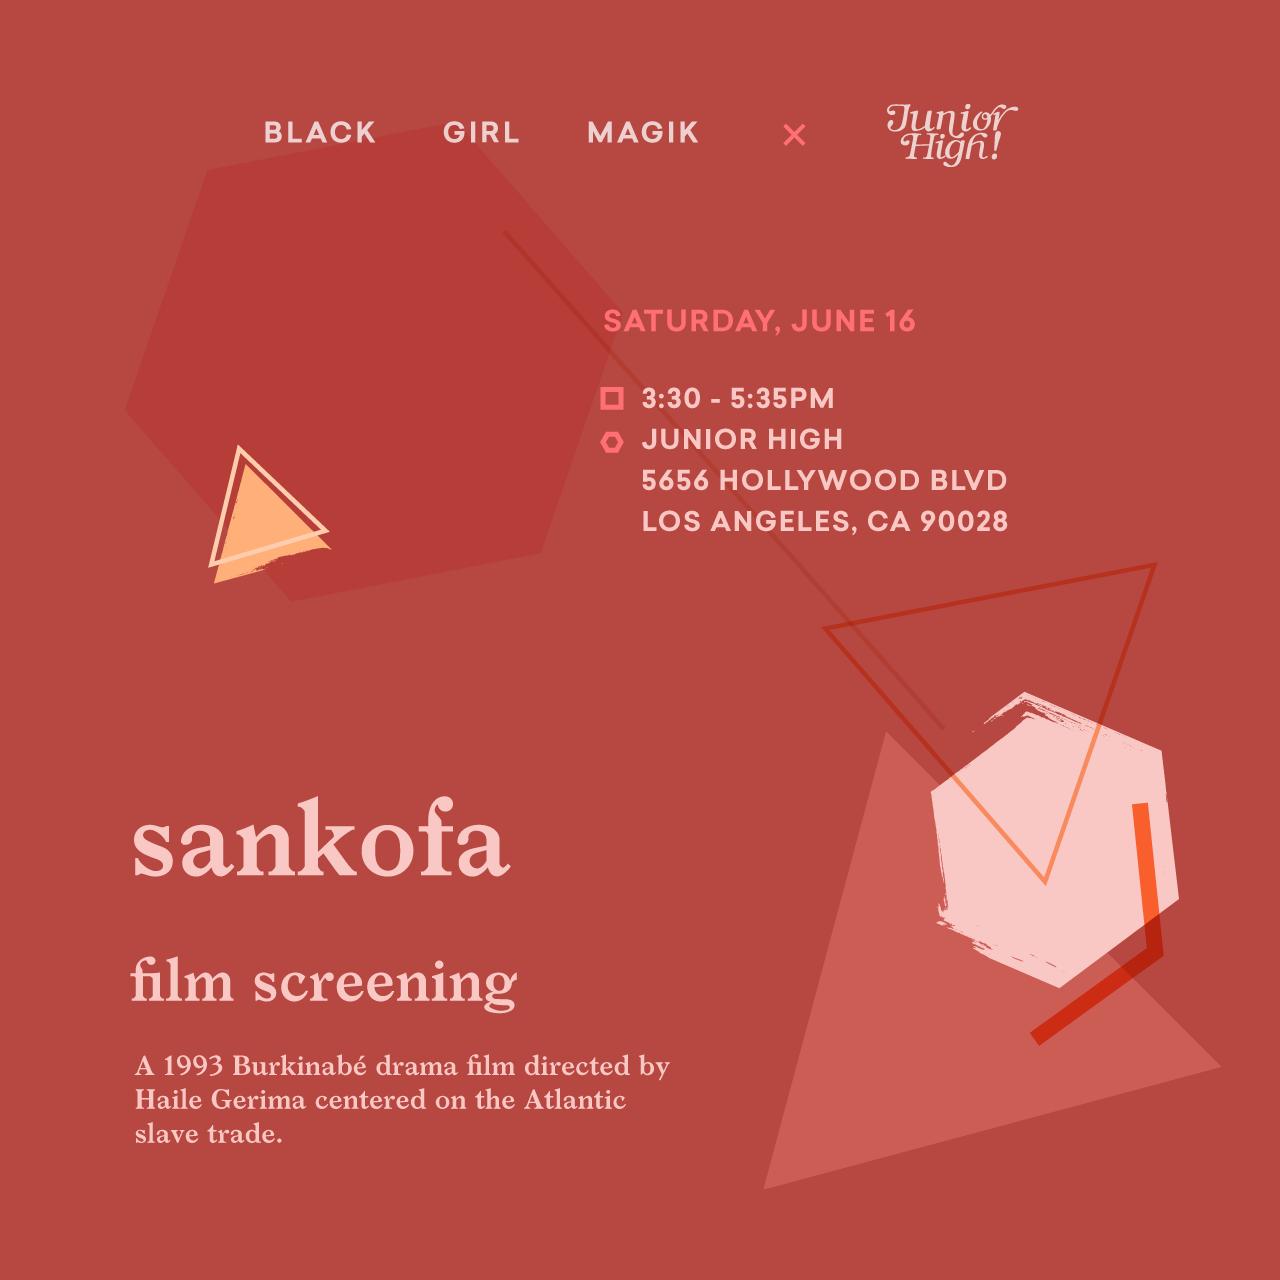 EVENTS_FILM_sankofa.png